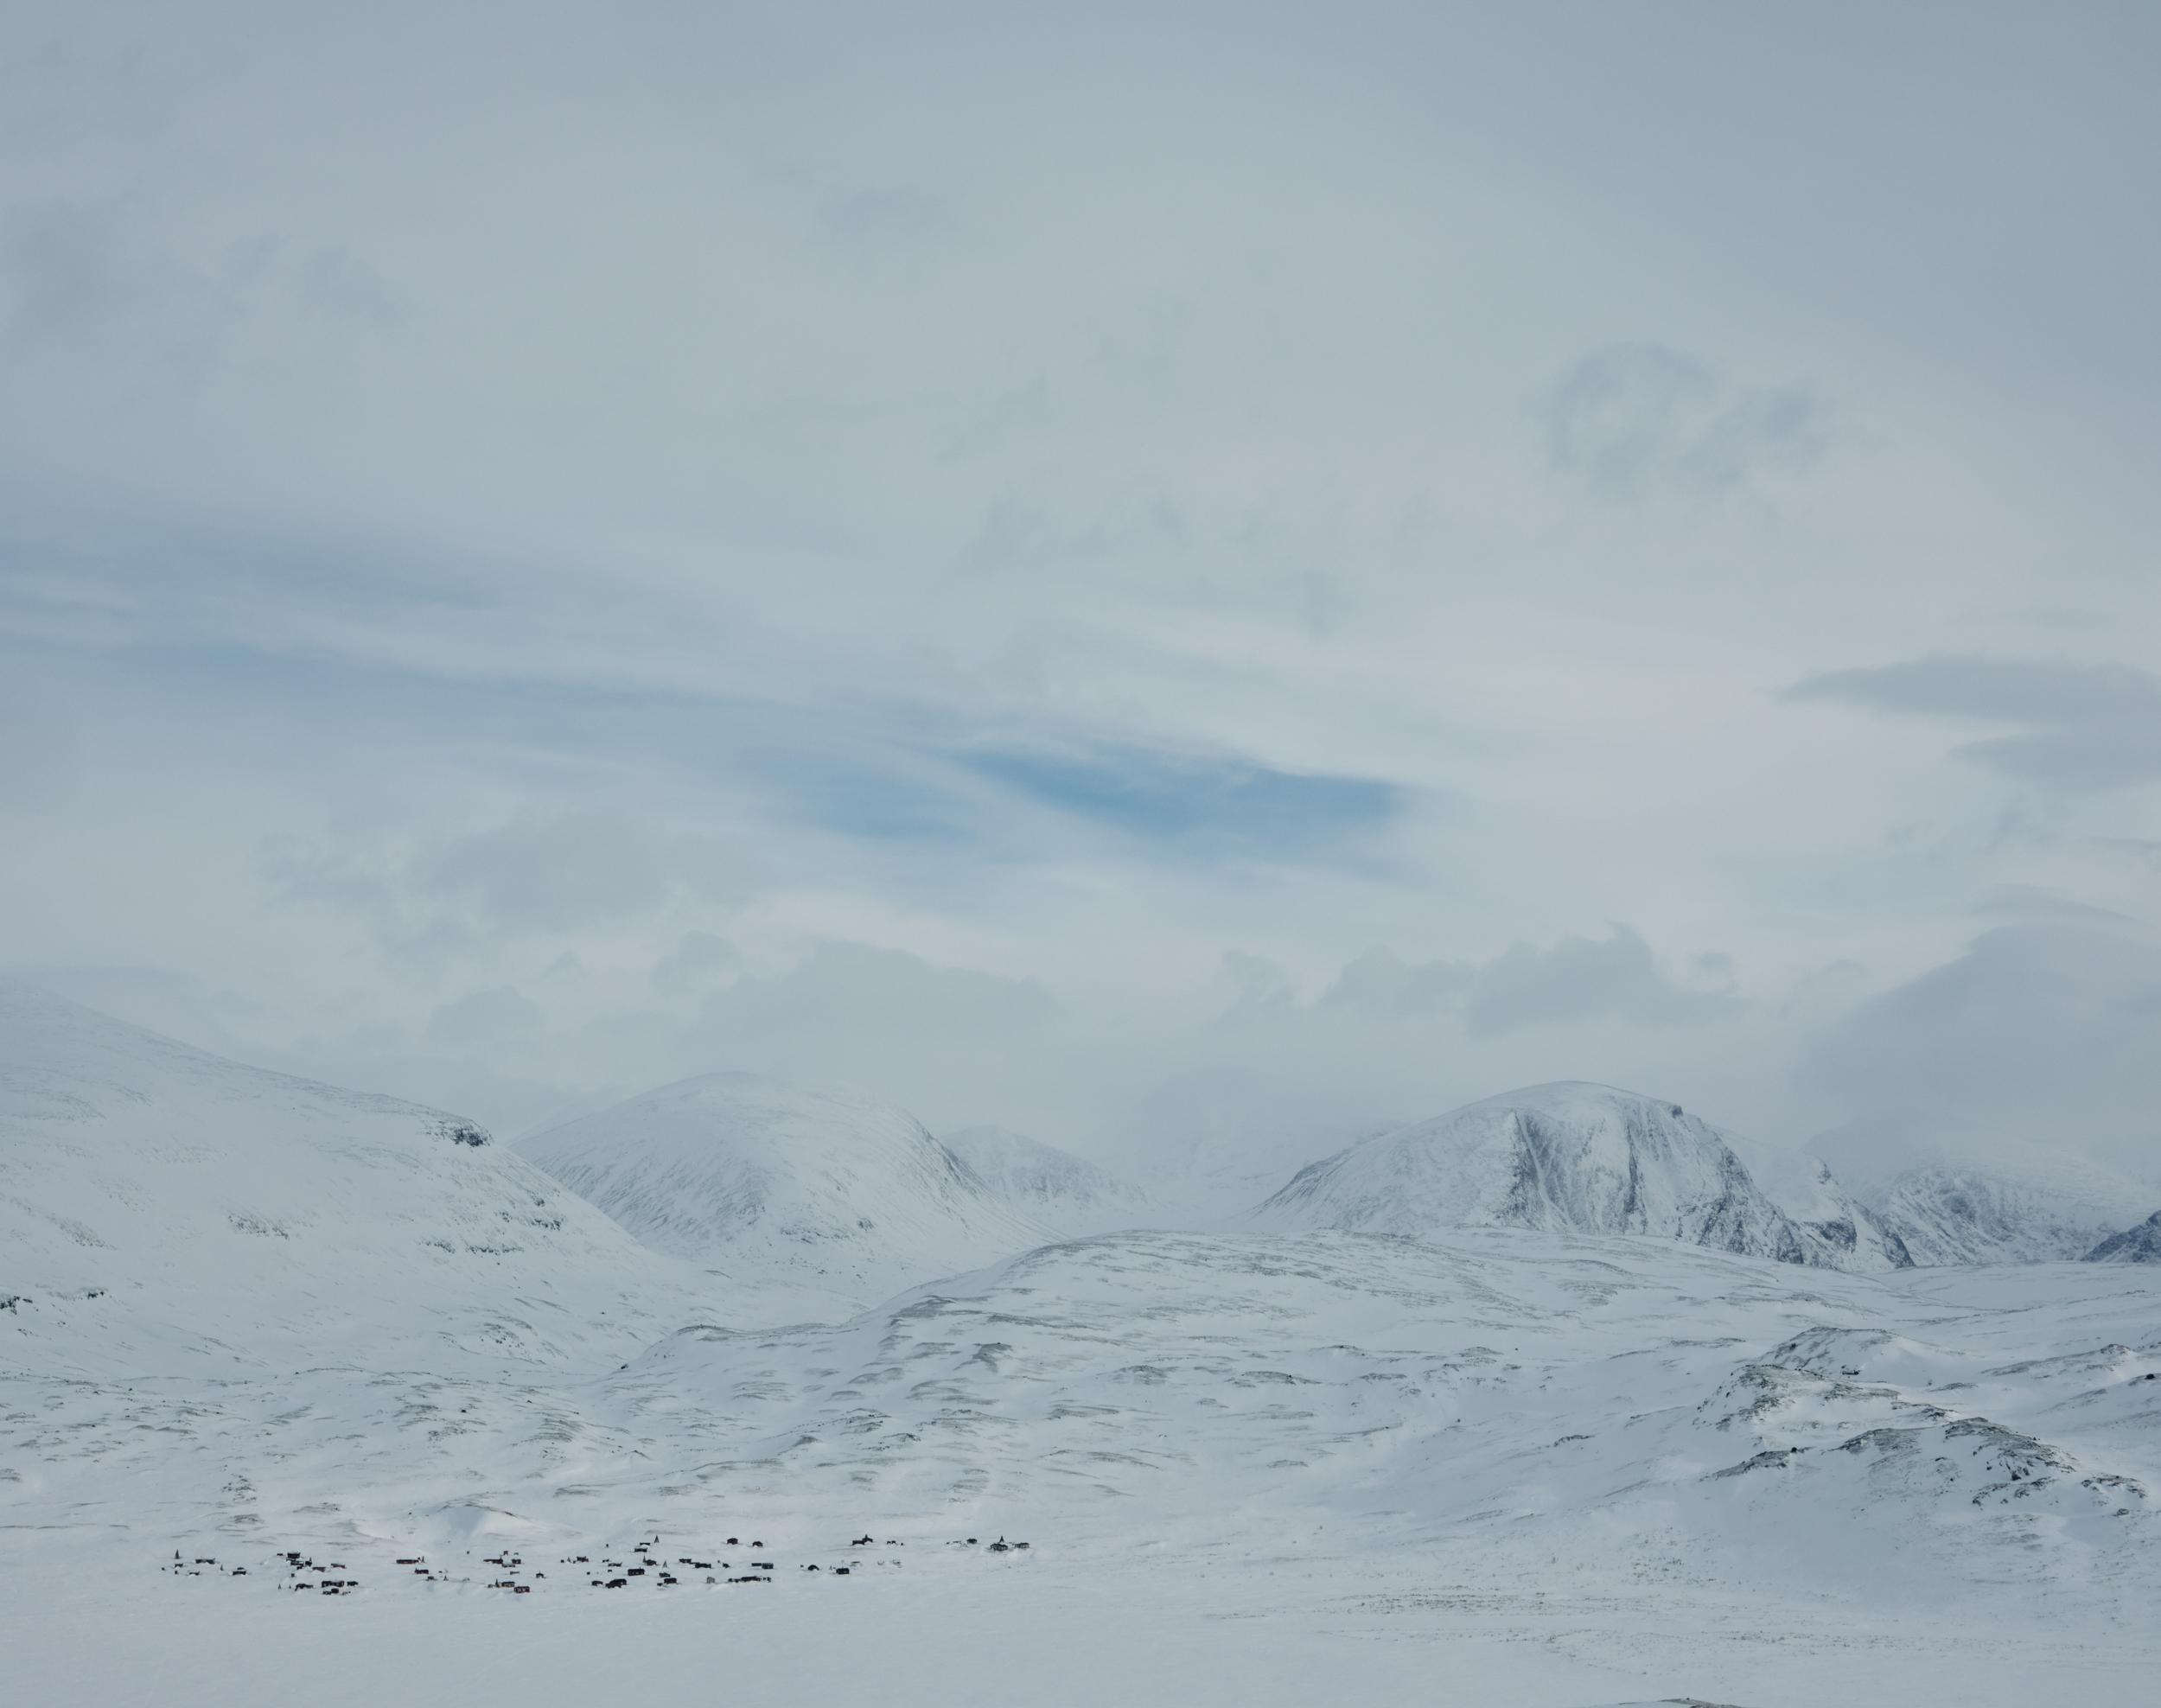 sgeo_20190329_Lappland_Winter_532.jpg